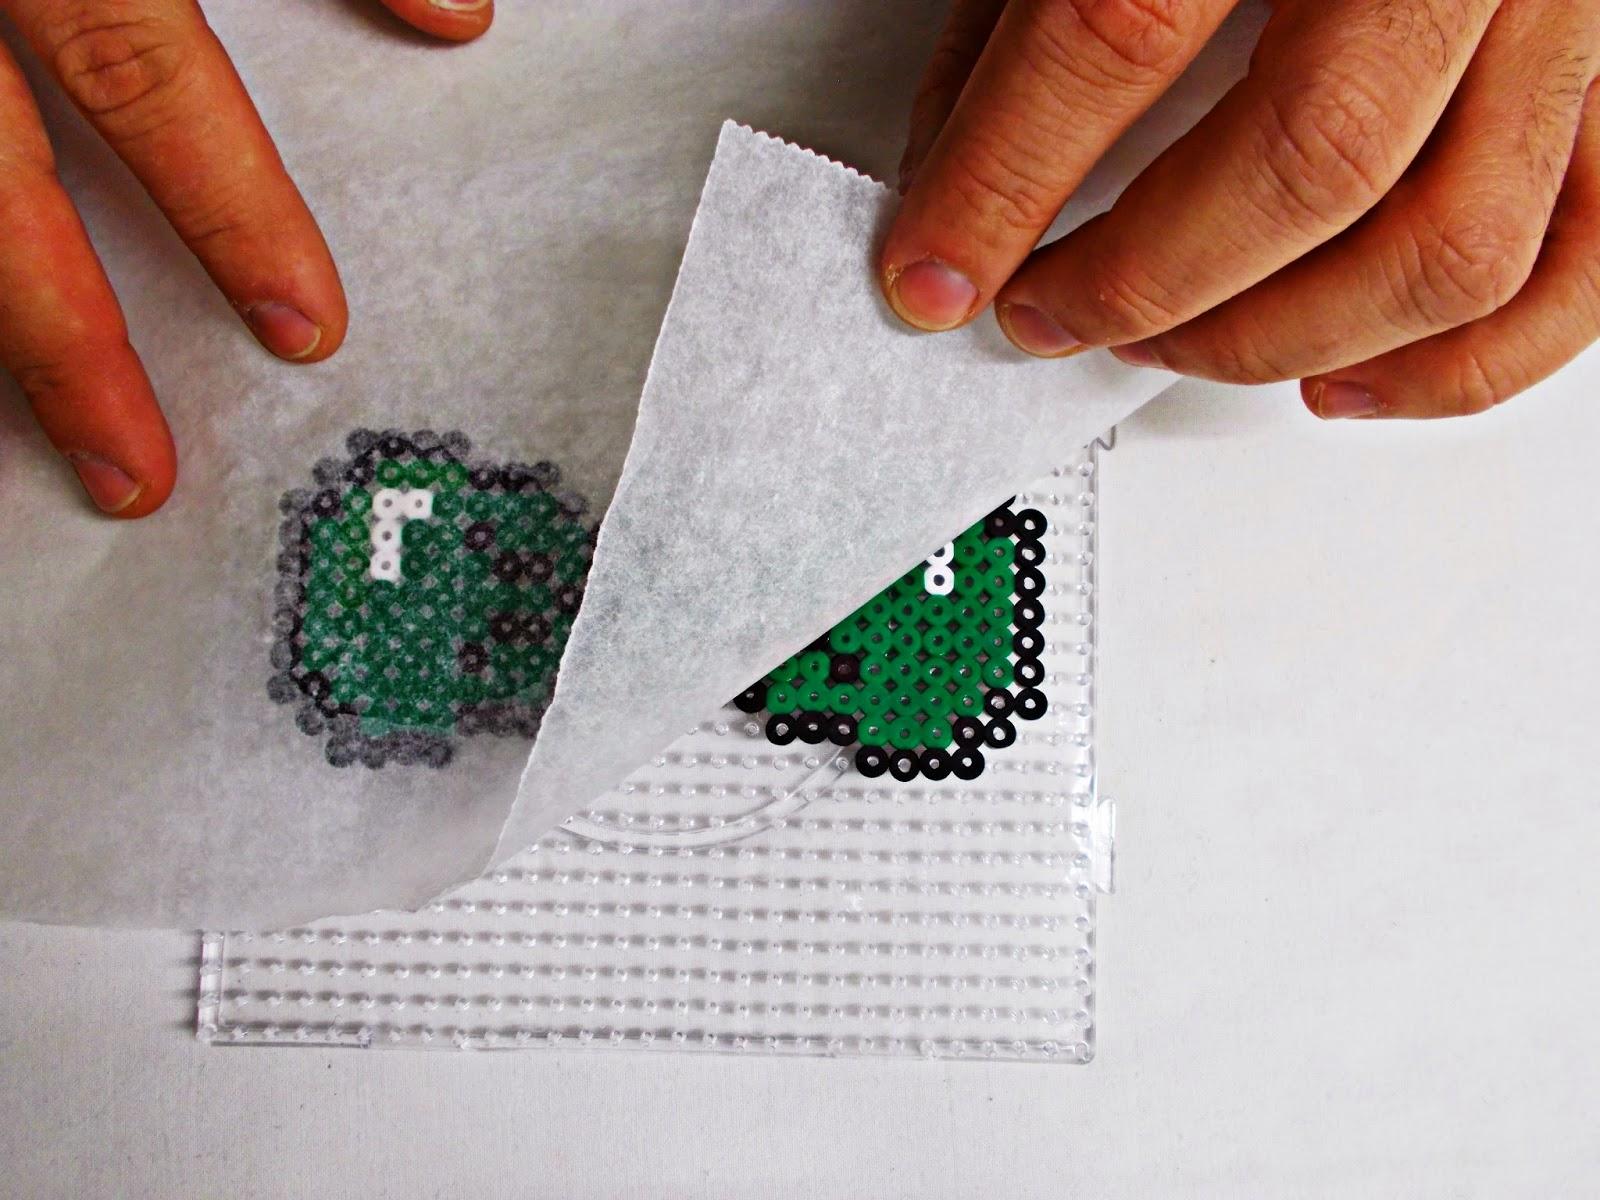 DIY-pajarita-tie bow-hama beads- DoItYourself-idea-moda-broche-4